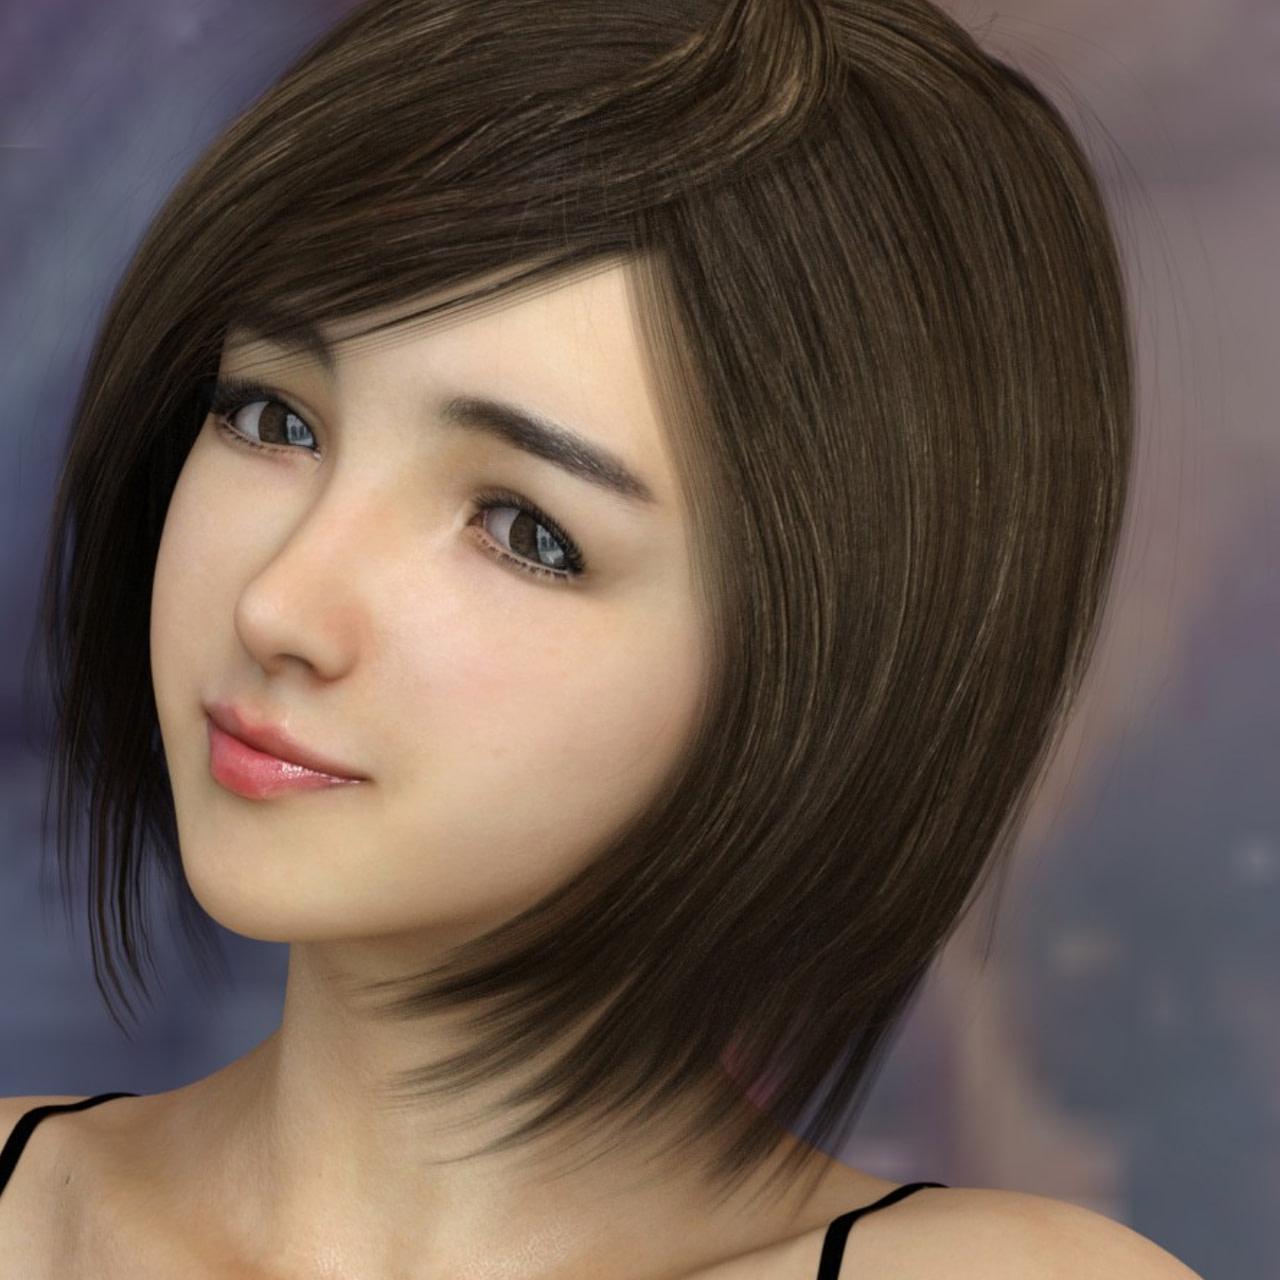 yoyo female daz asian character